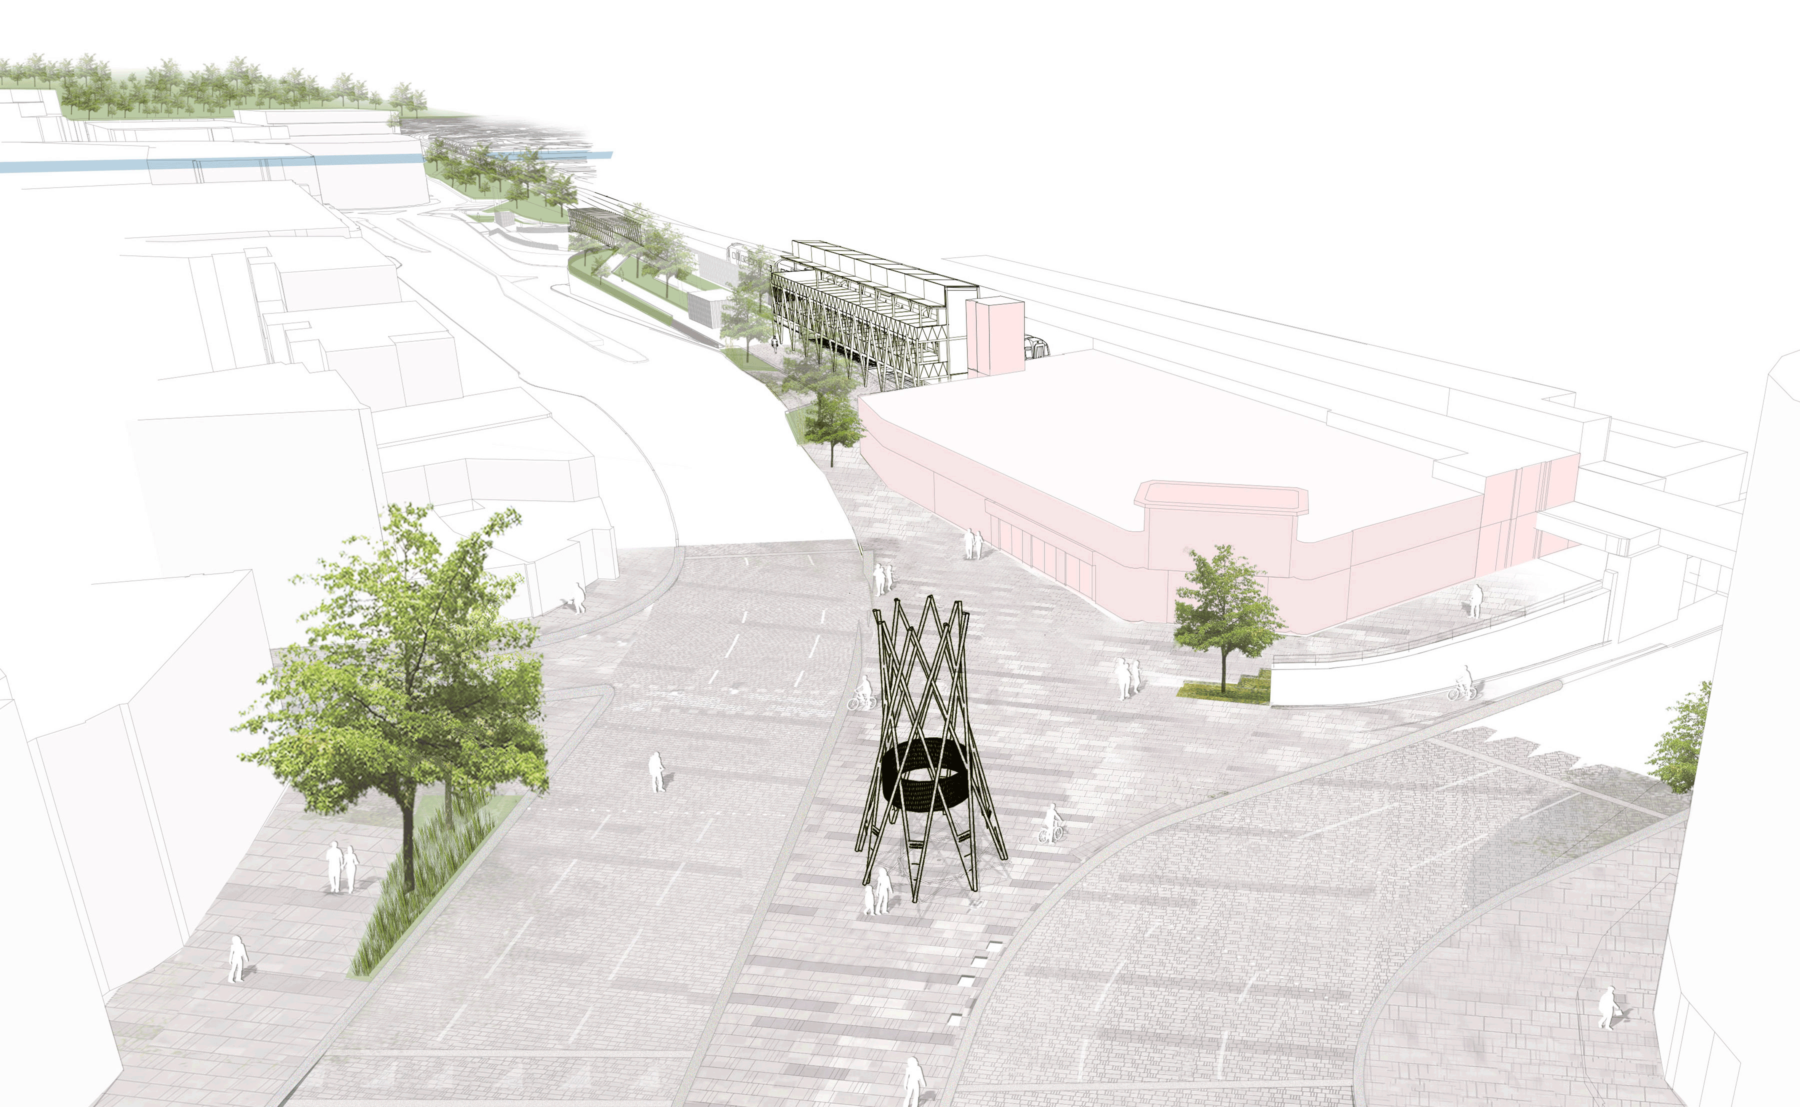 Sarah-Wigglesworth-Architects Kingston-Mini-Holland Context Overall 3600